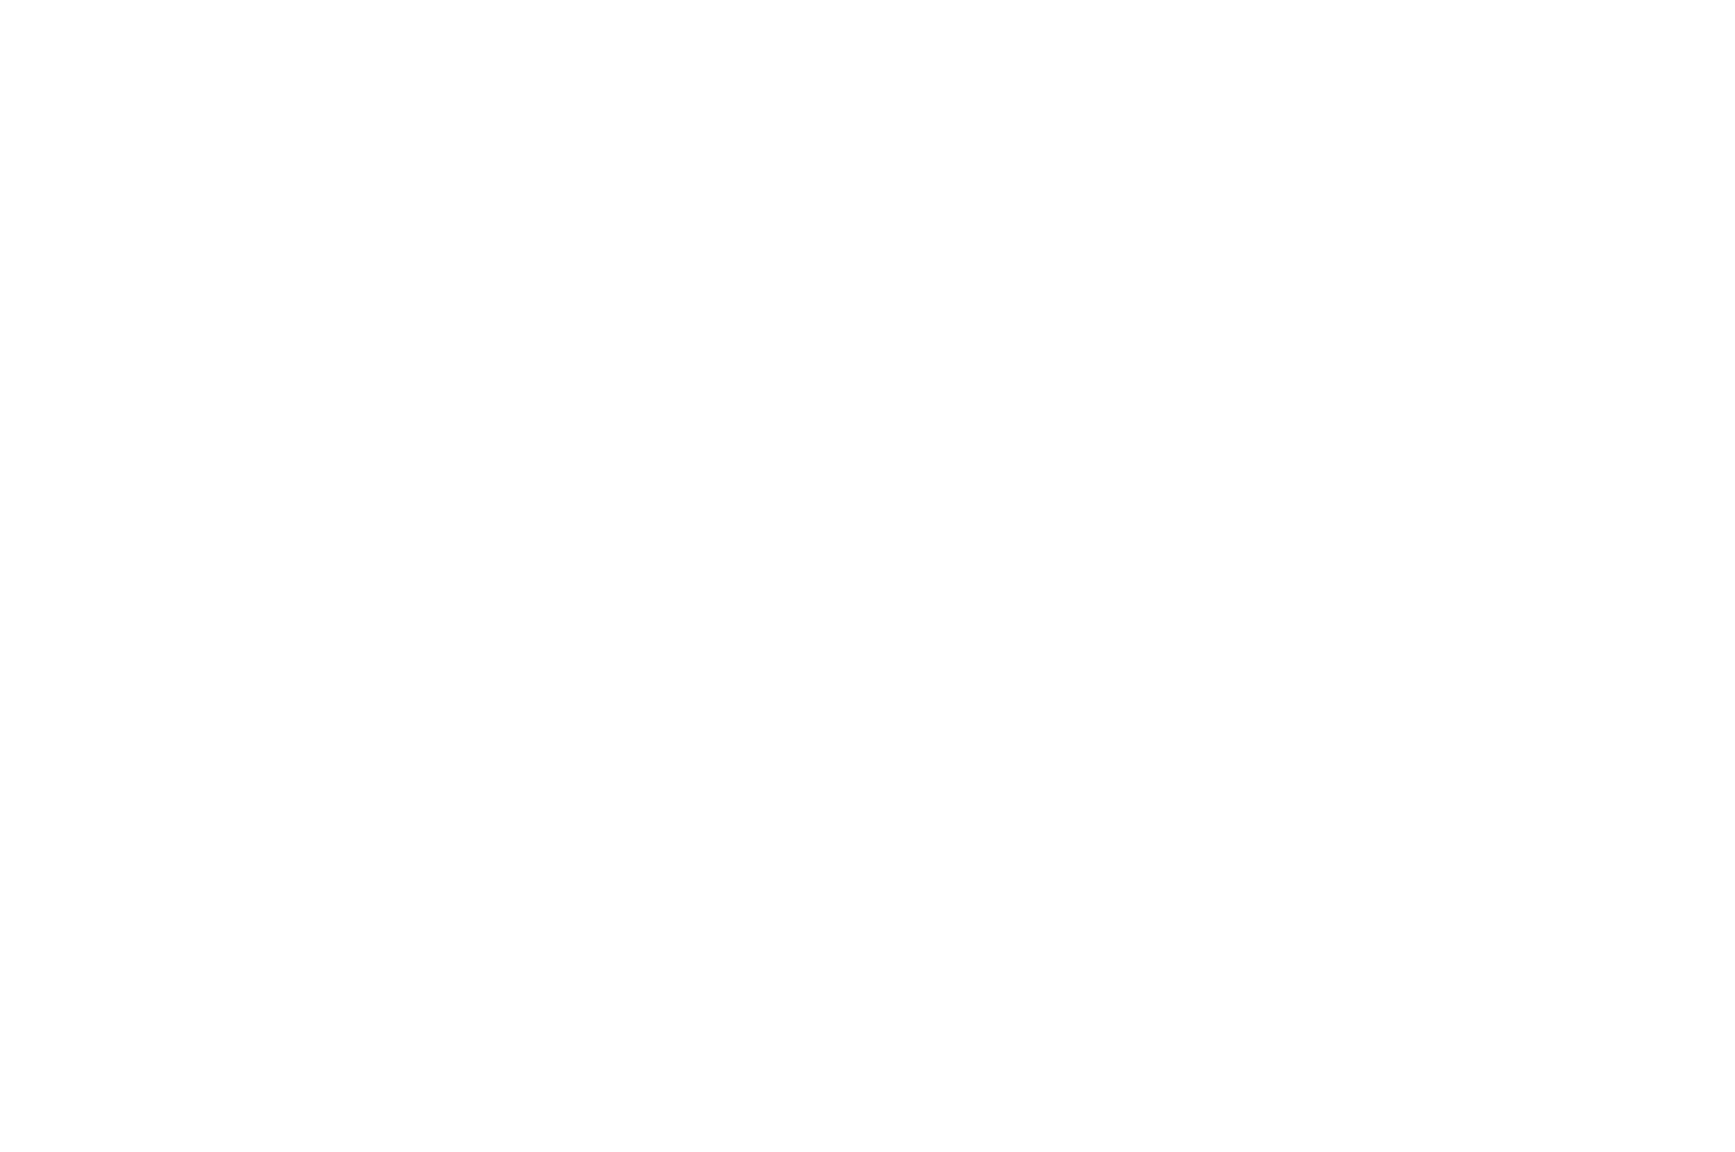 FINALIST - The Indie Horror Film Festival - 2020